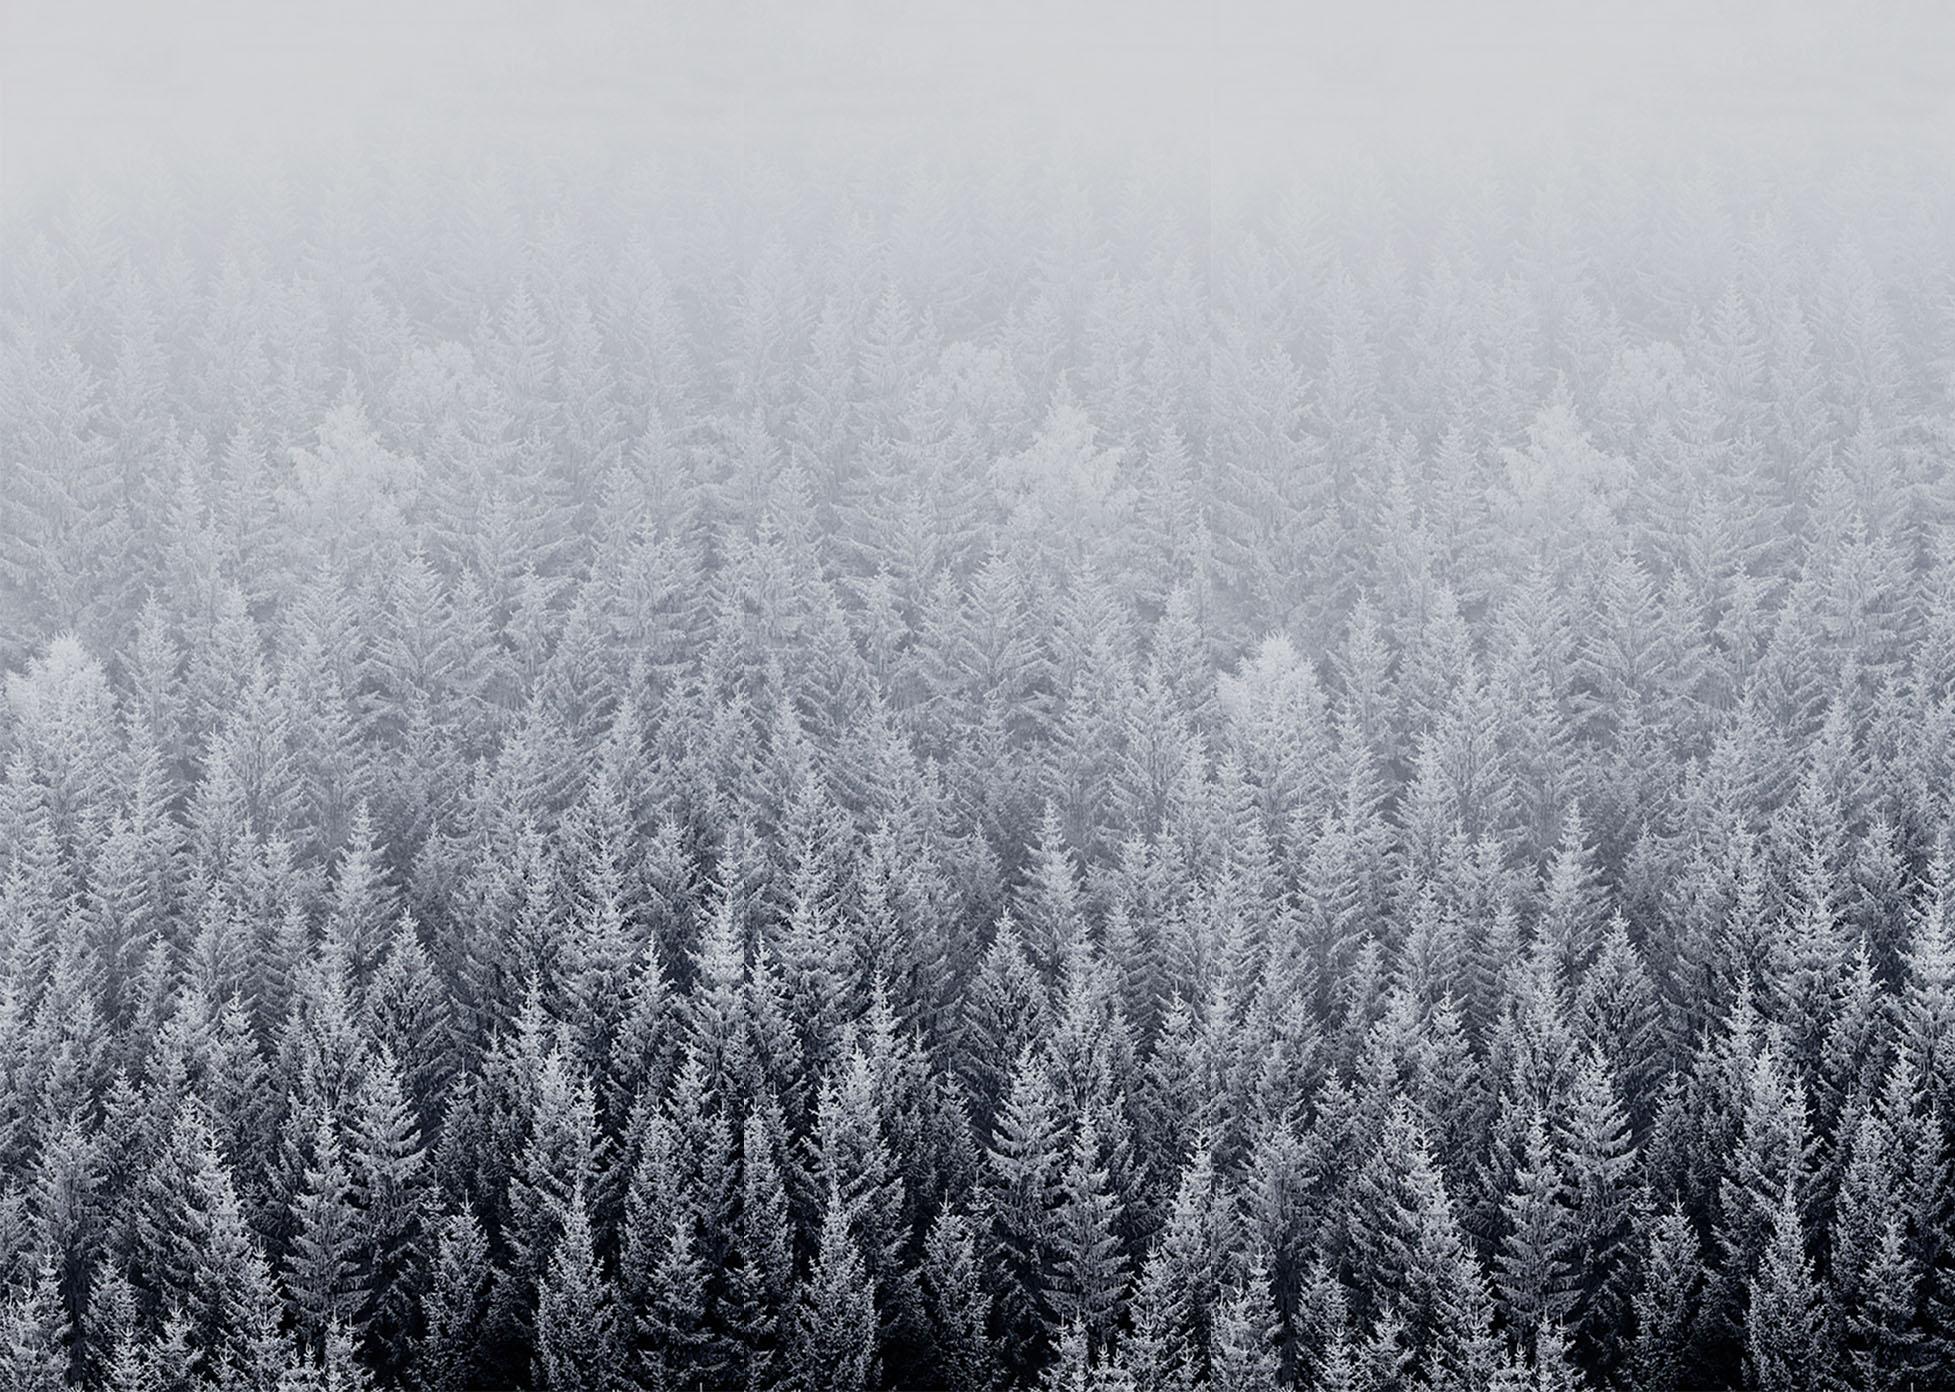 iOS 8 Snow Forest Default Mac Desktop